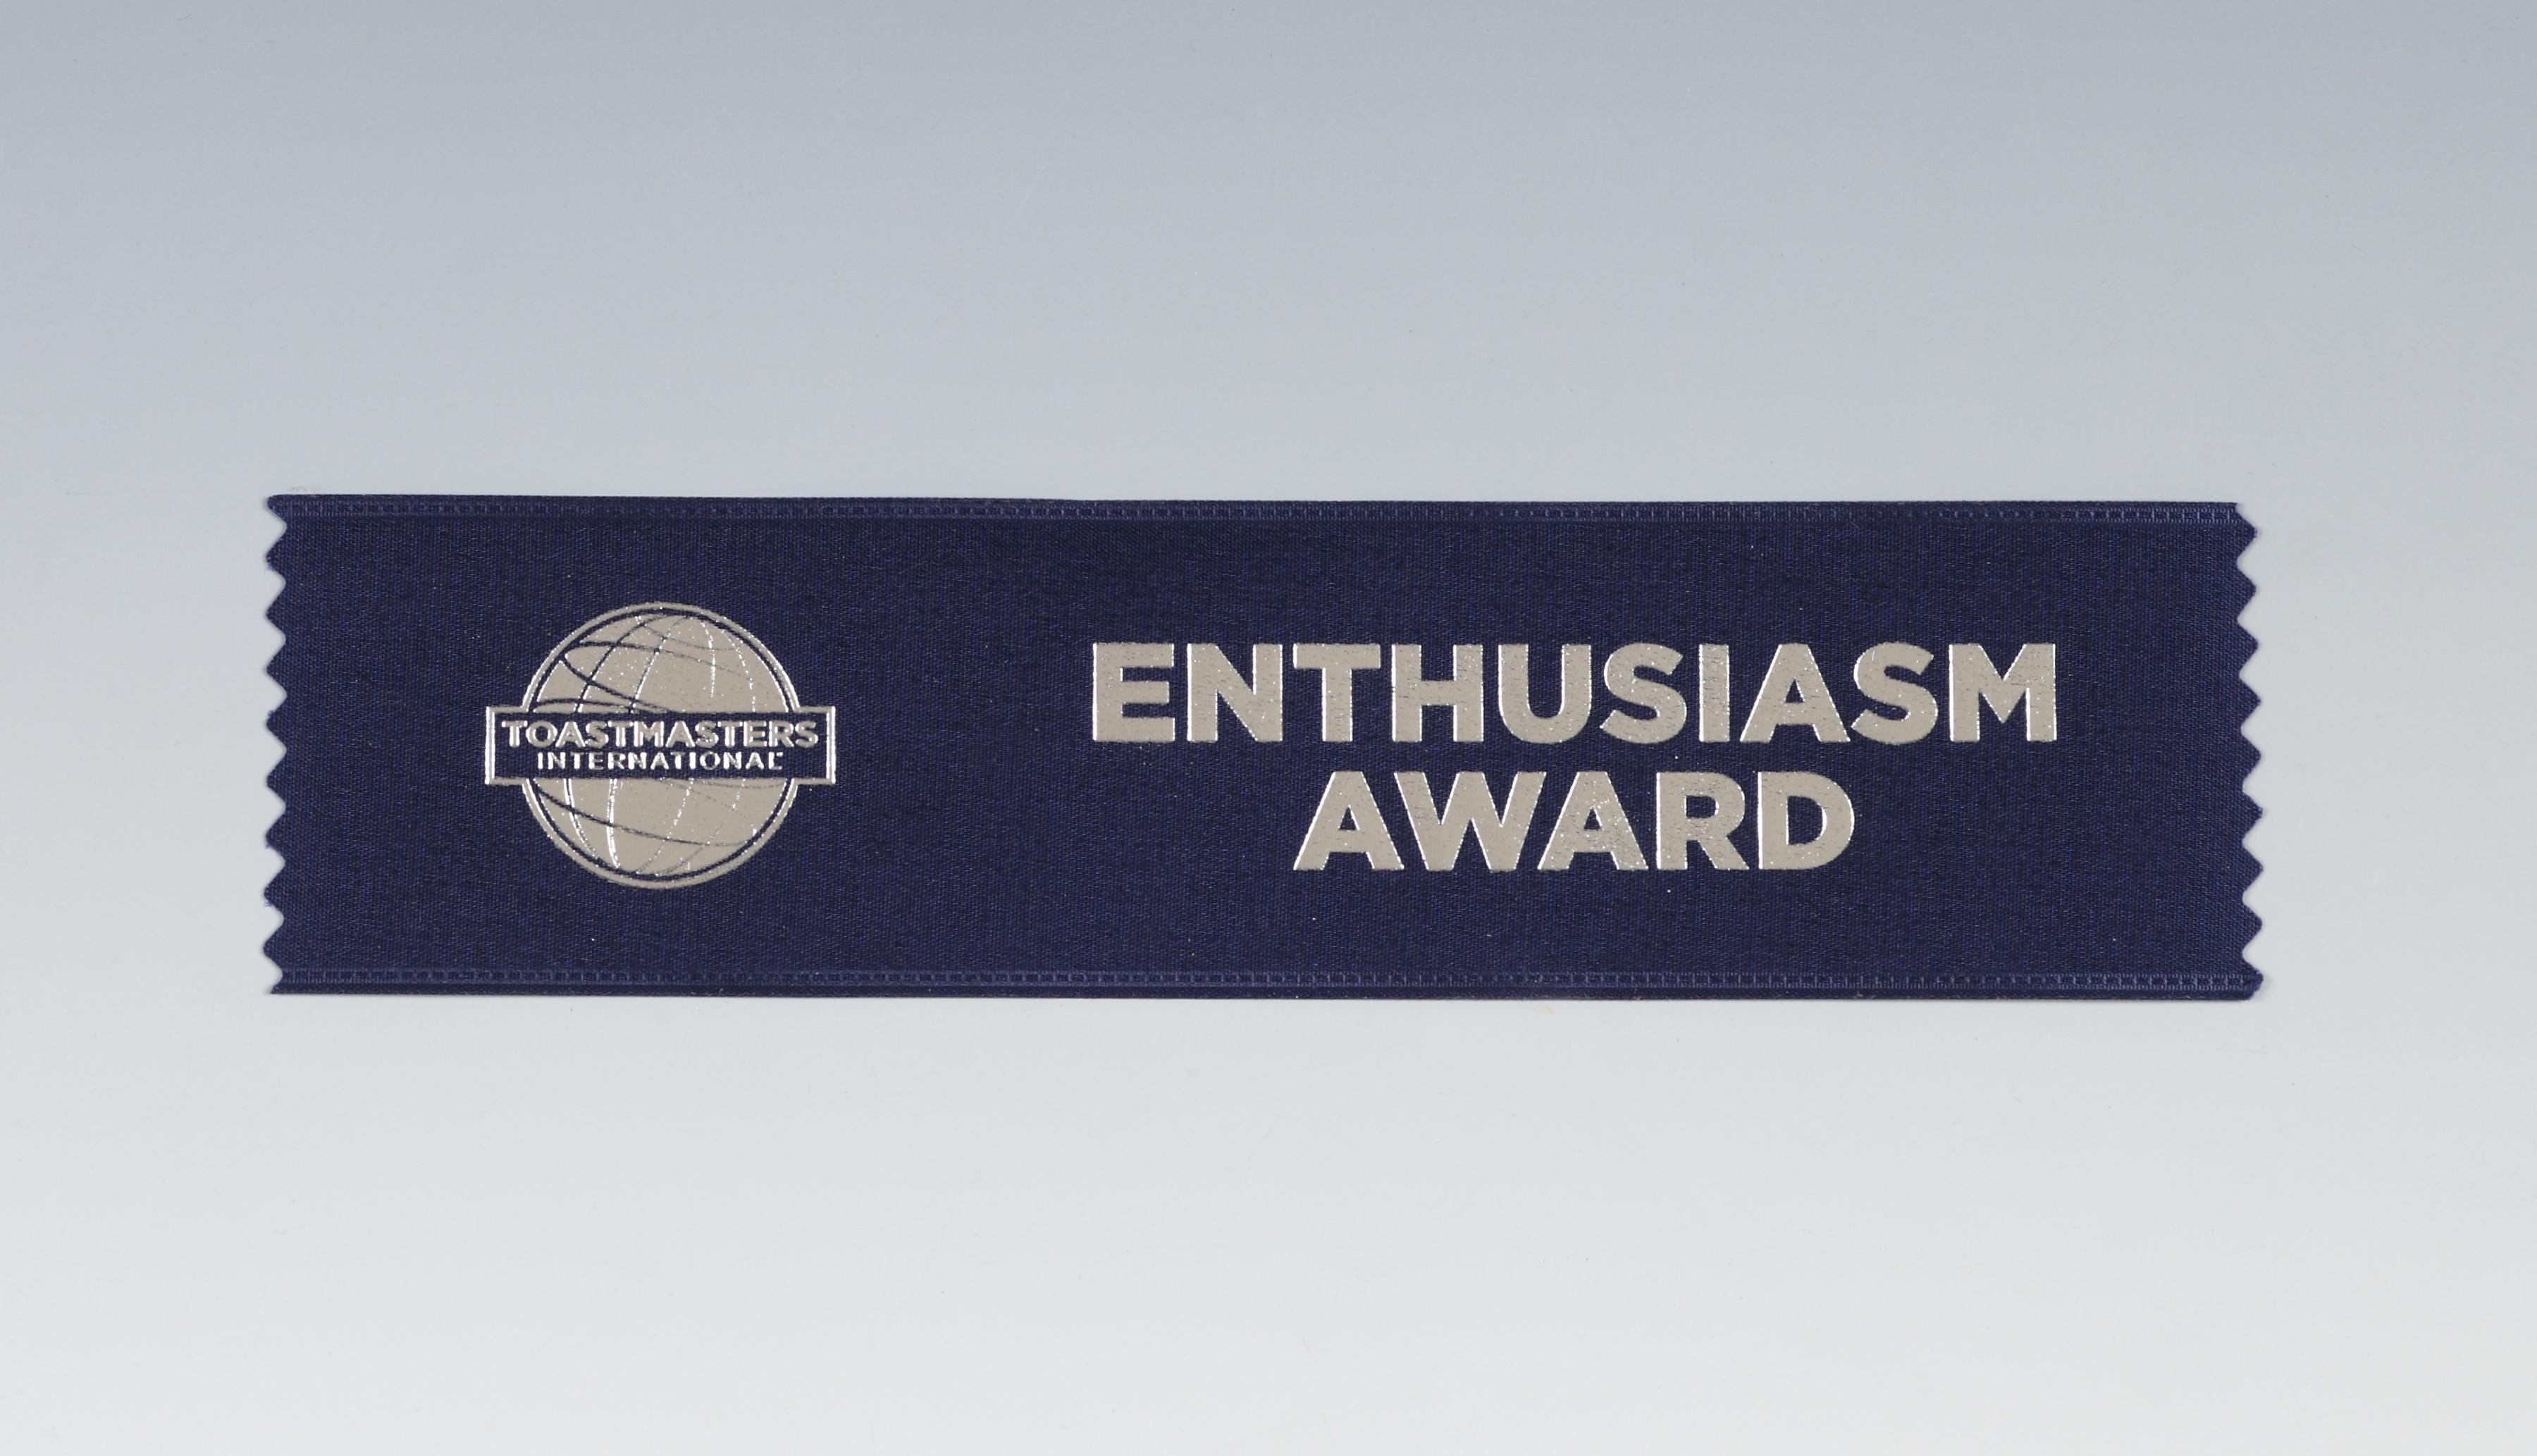 Enthusiasm Award Ribbon